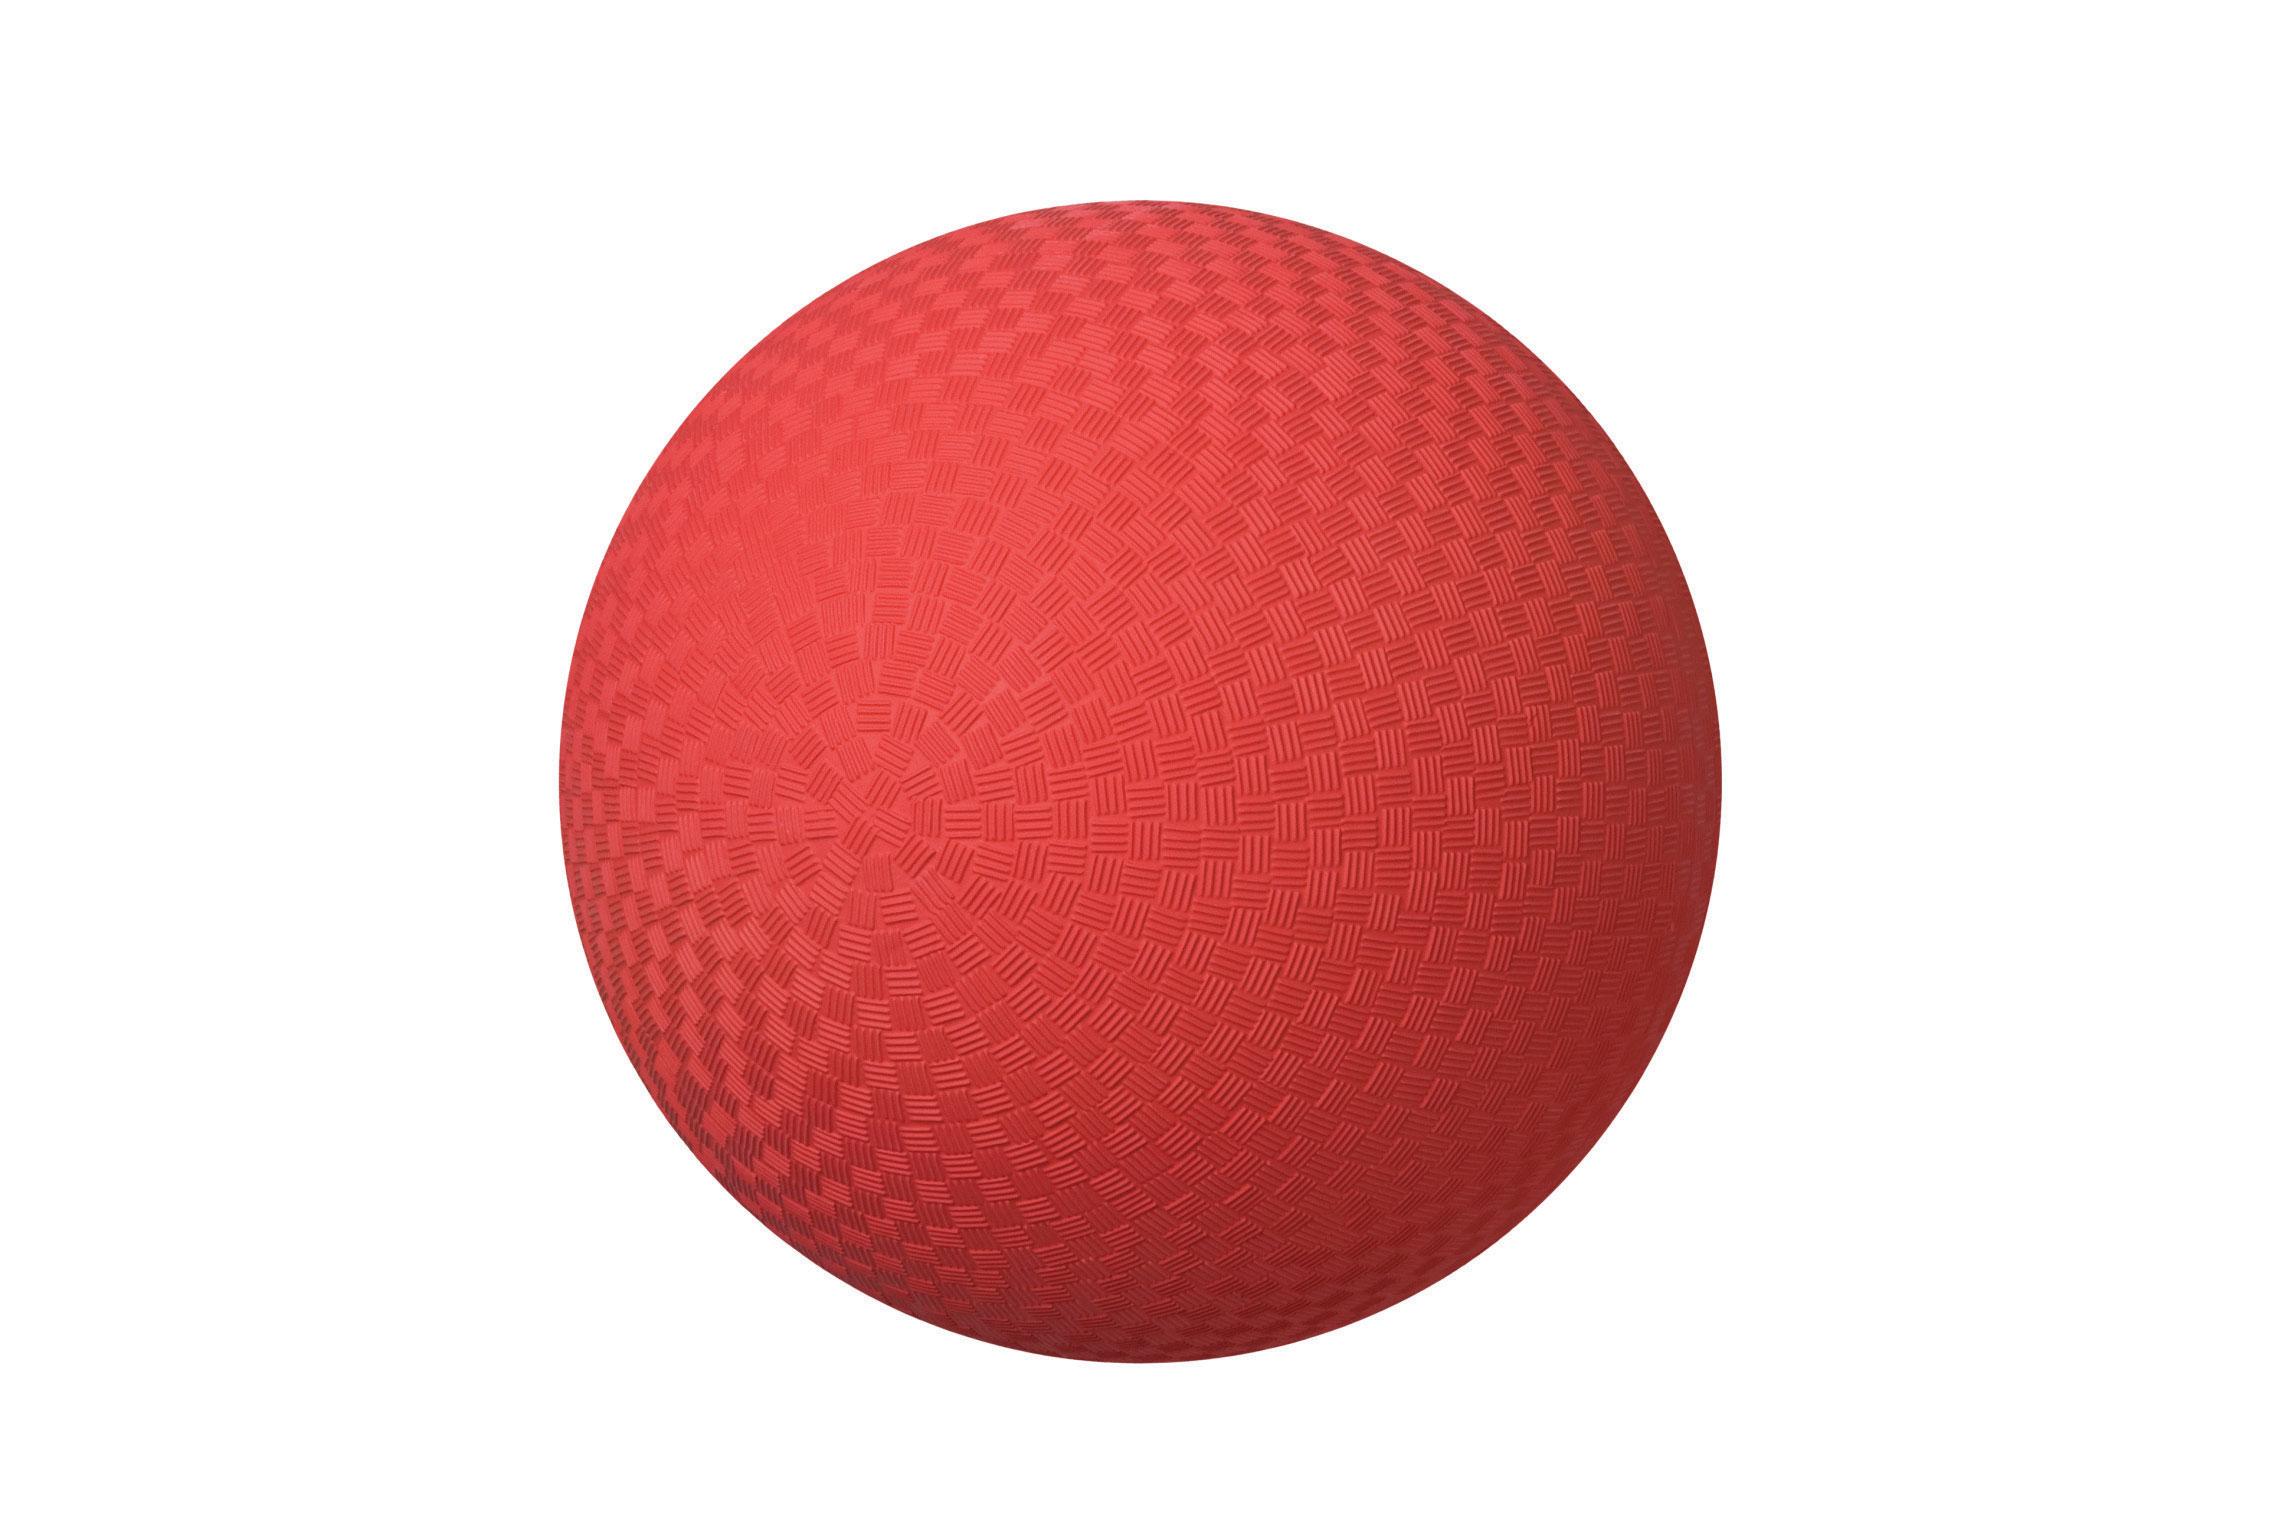 Clip Art Kickball Clipart kickball clipart free best clip art tumundografico